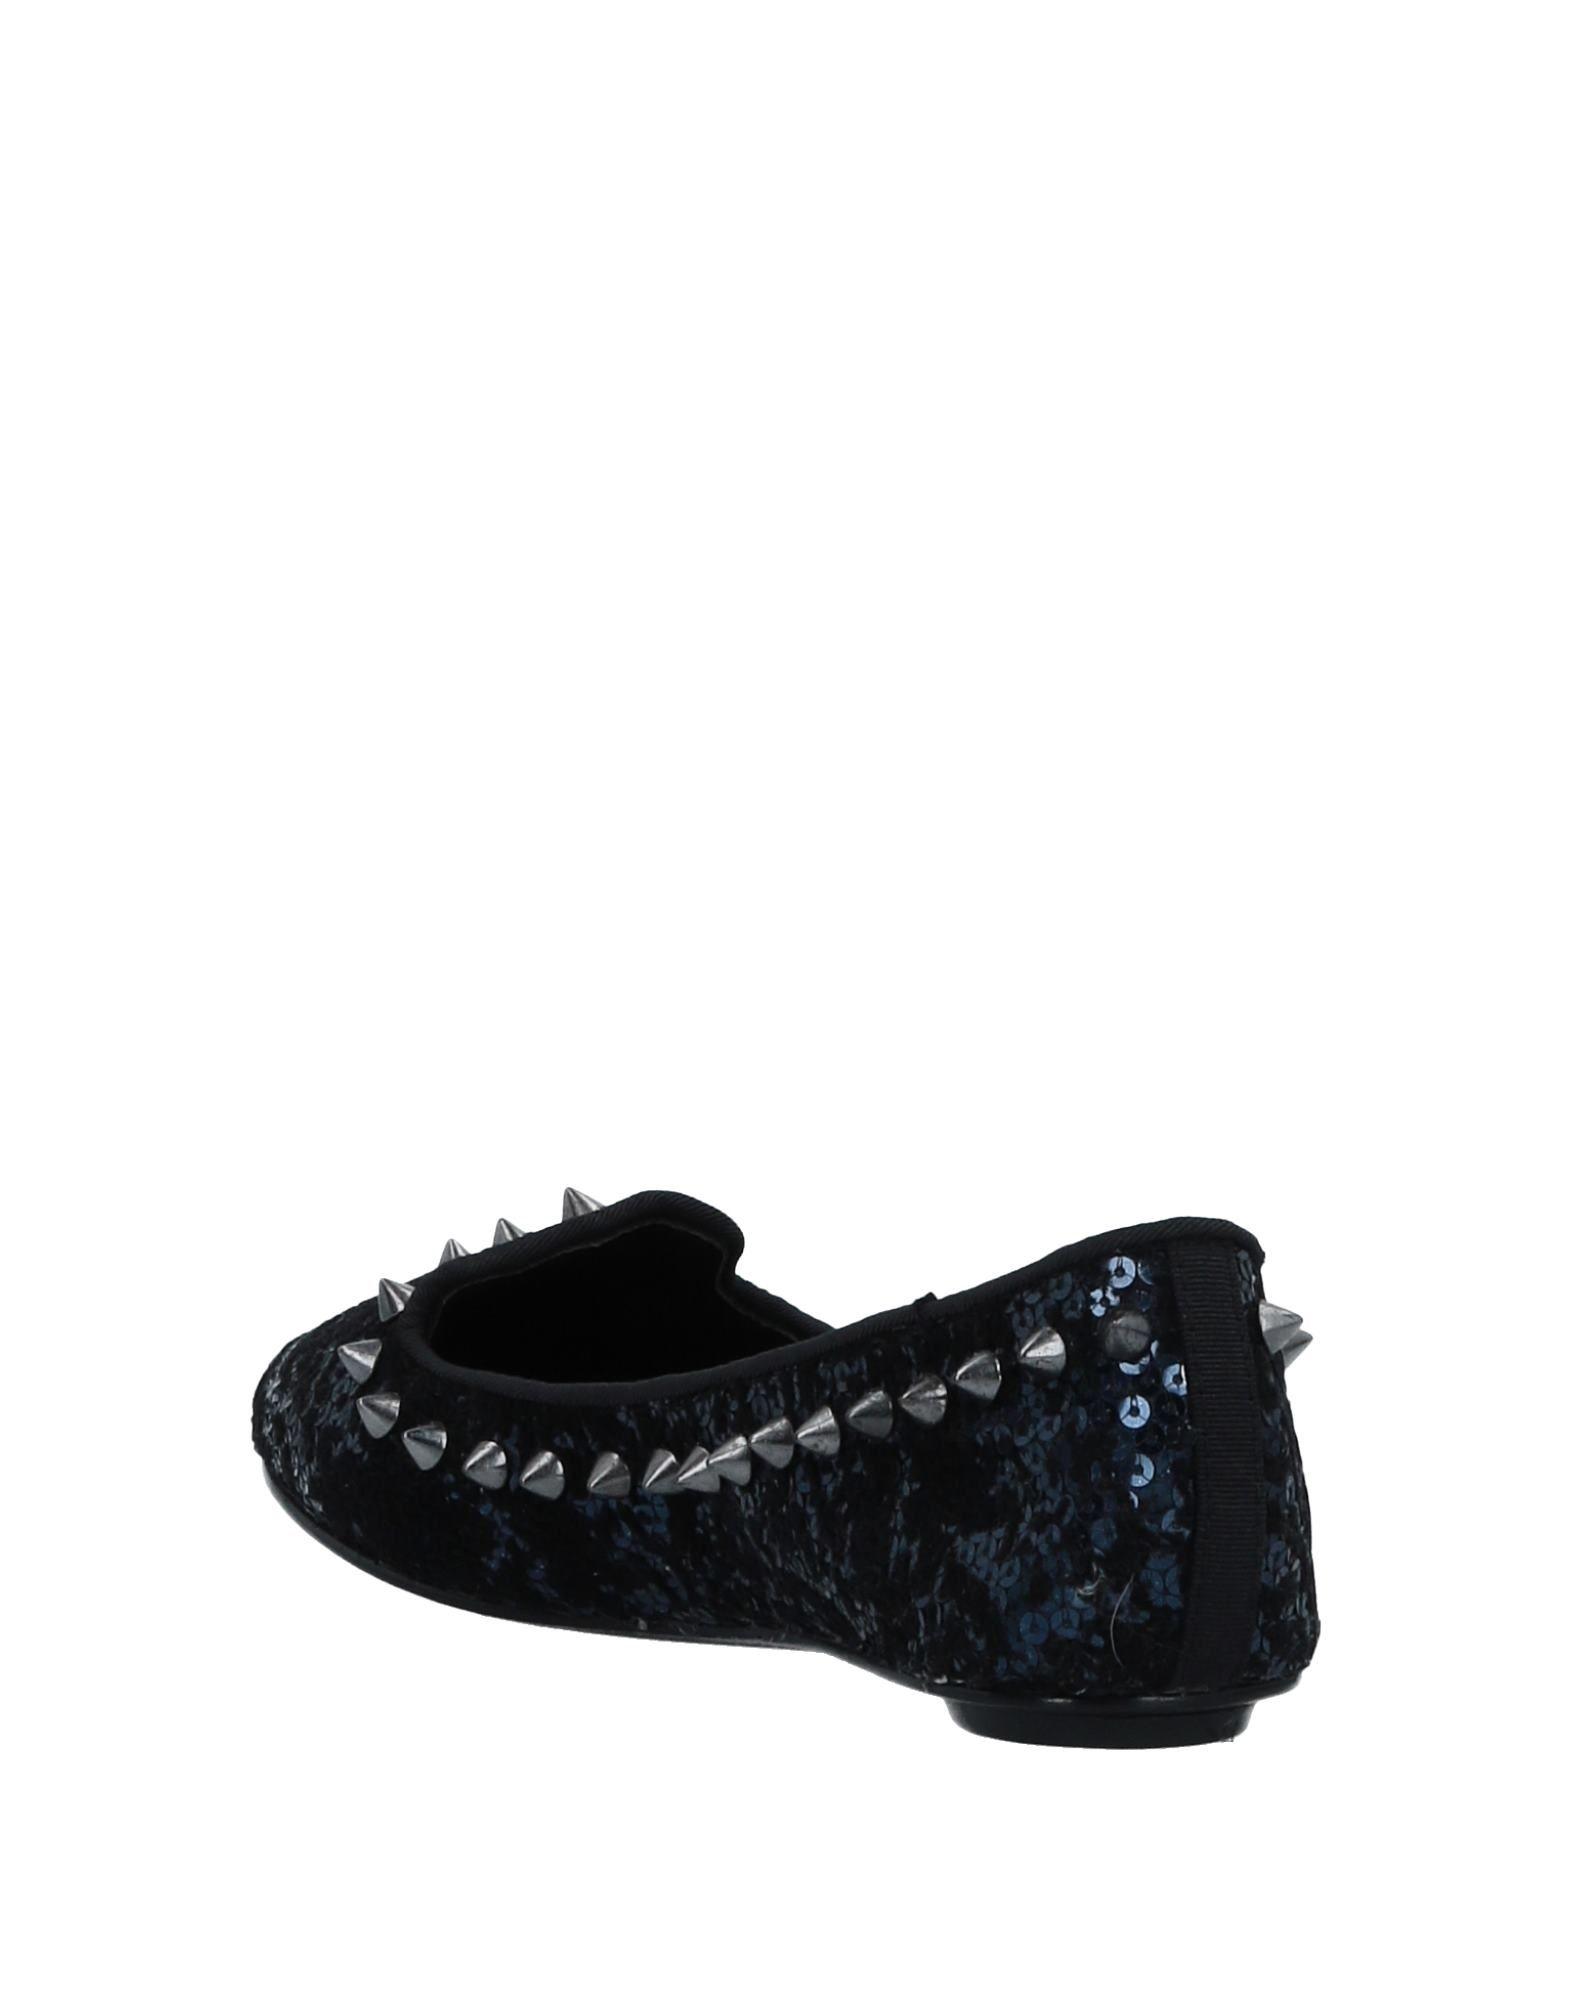 Ash Gute Mokassins Damen  11513512LA Gute Ash Qualität beliebte Schuhe 0522ca